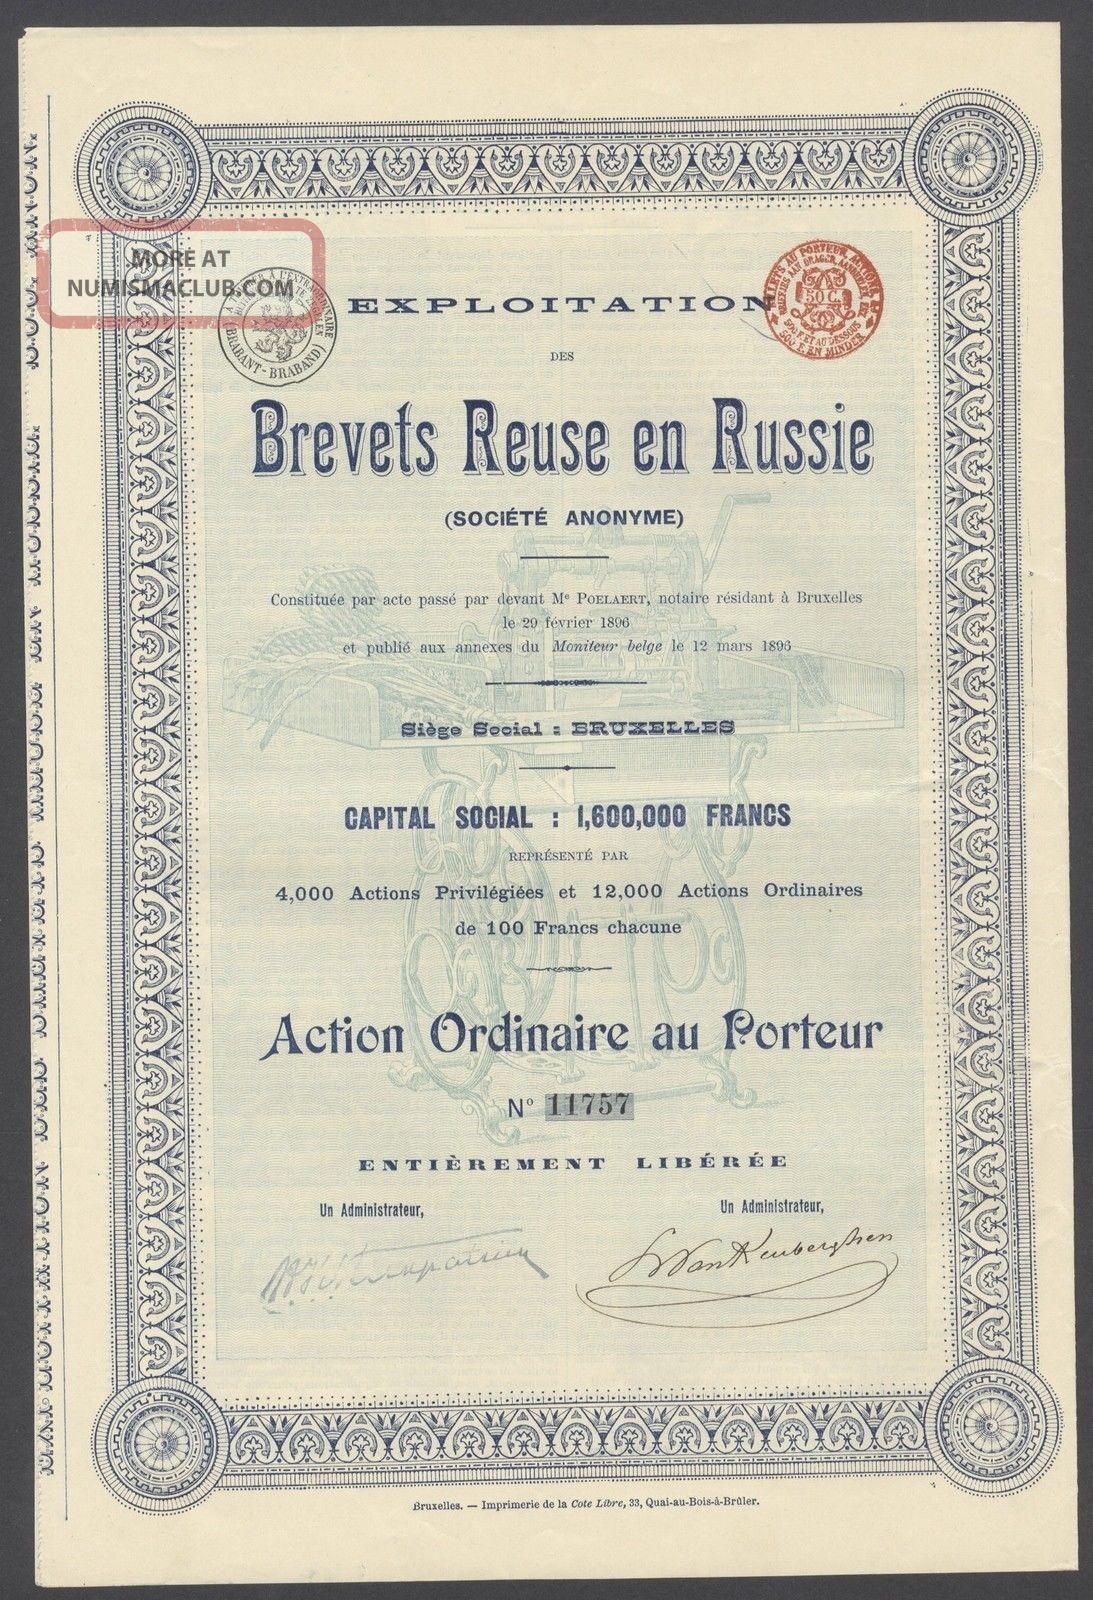 Belgium 1896 Illustrated Bond Brevets Reuse En Russie - Tabac Tobacco.  R4041 World photo